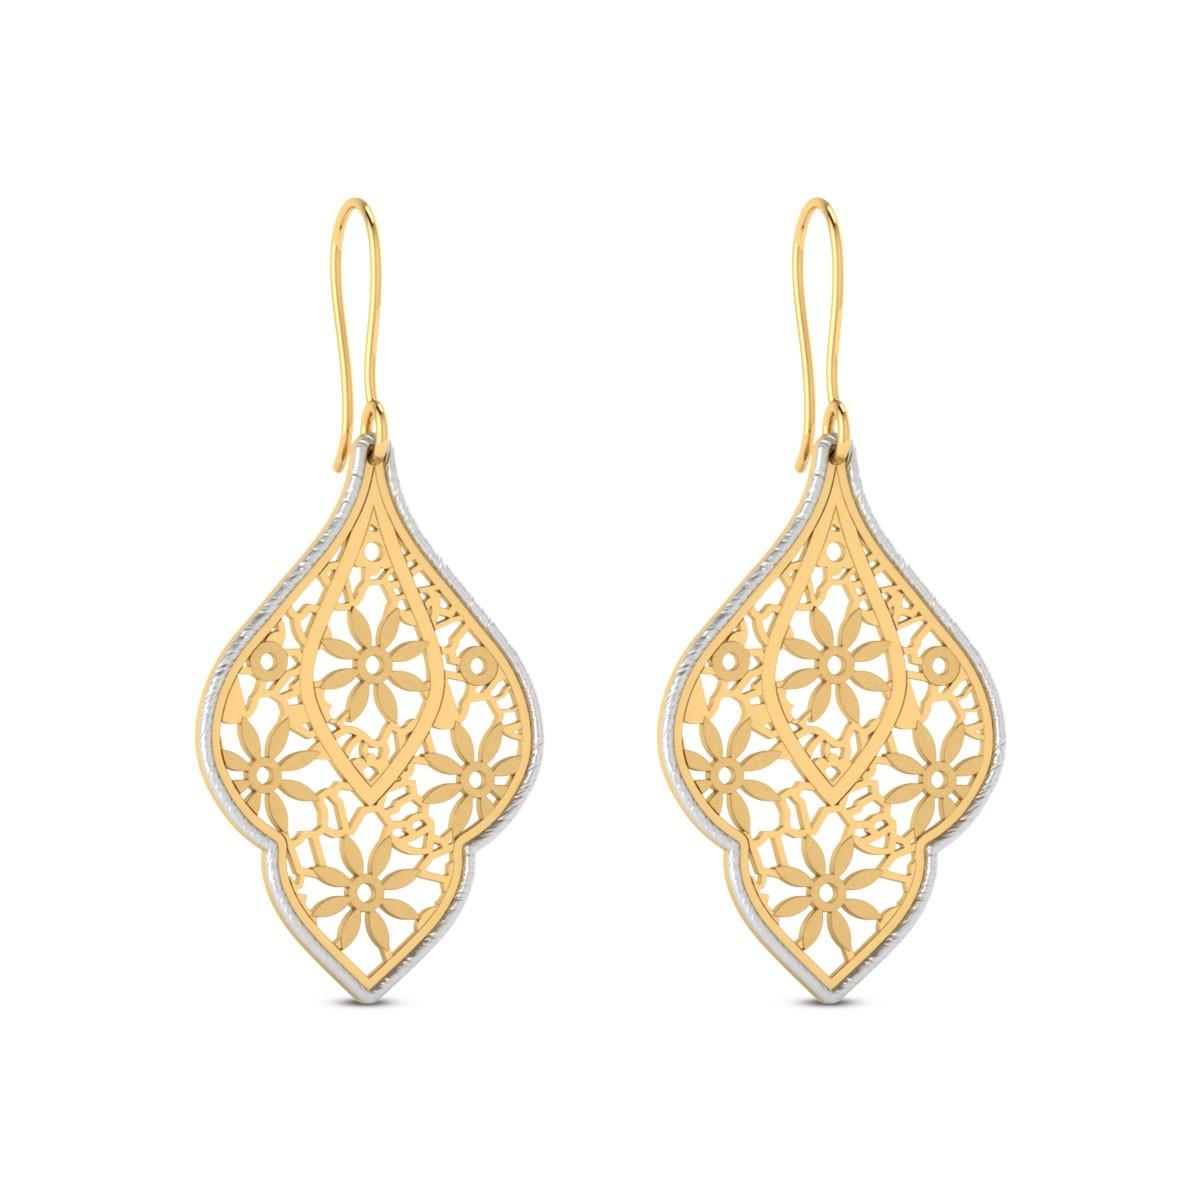 Kagome Cutout Gold Hanging Earrings